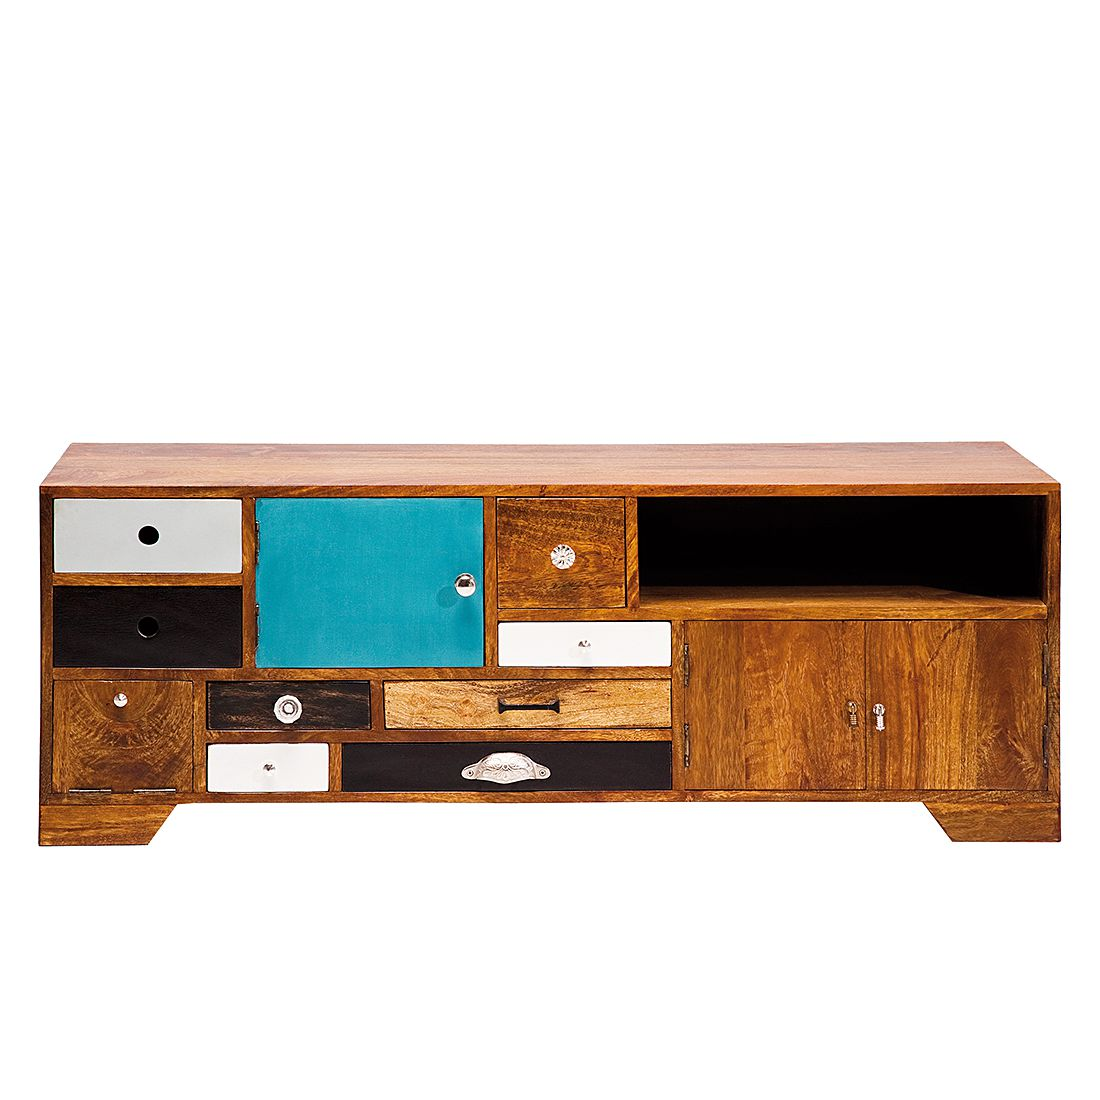 lowboards holz preisvergleich die besten angebote online. Black Bedroom Furniture Sets. Home Design Ideas